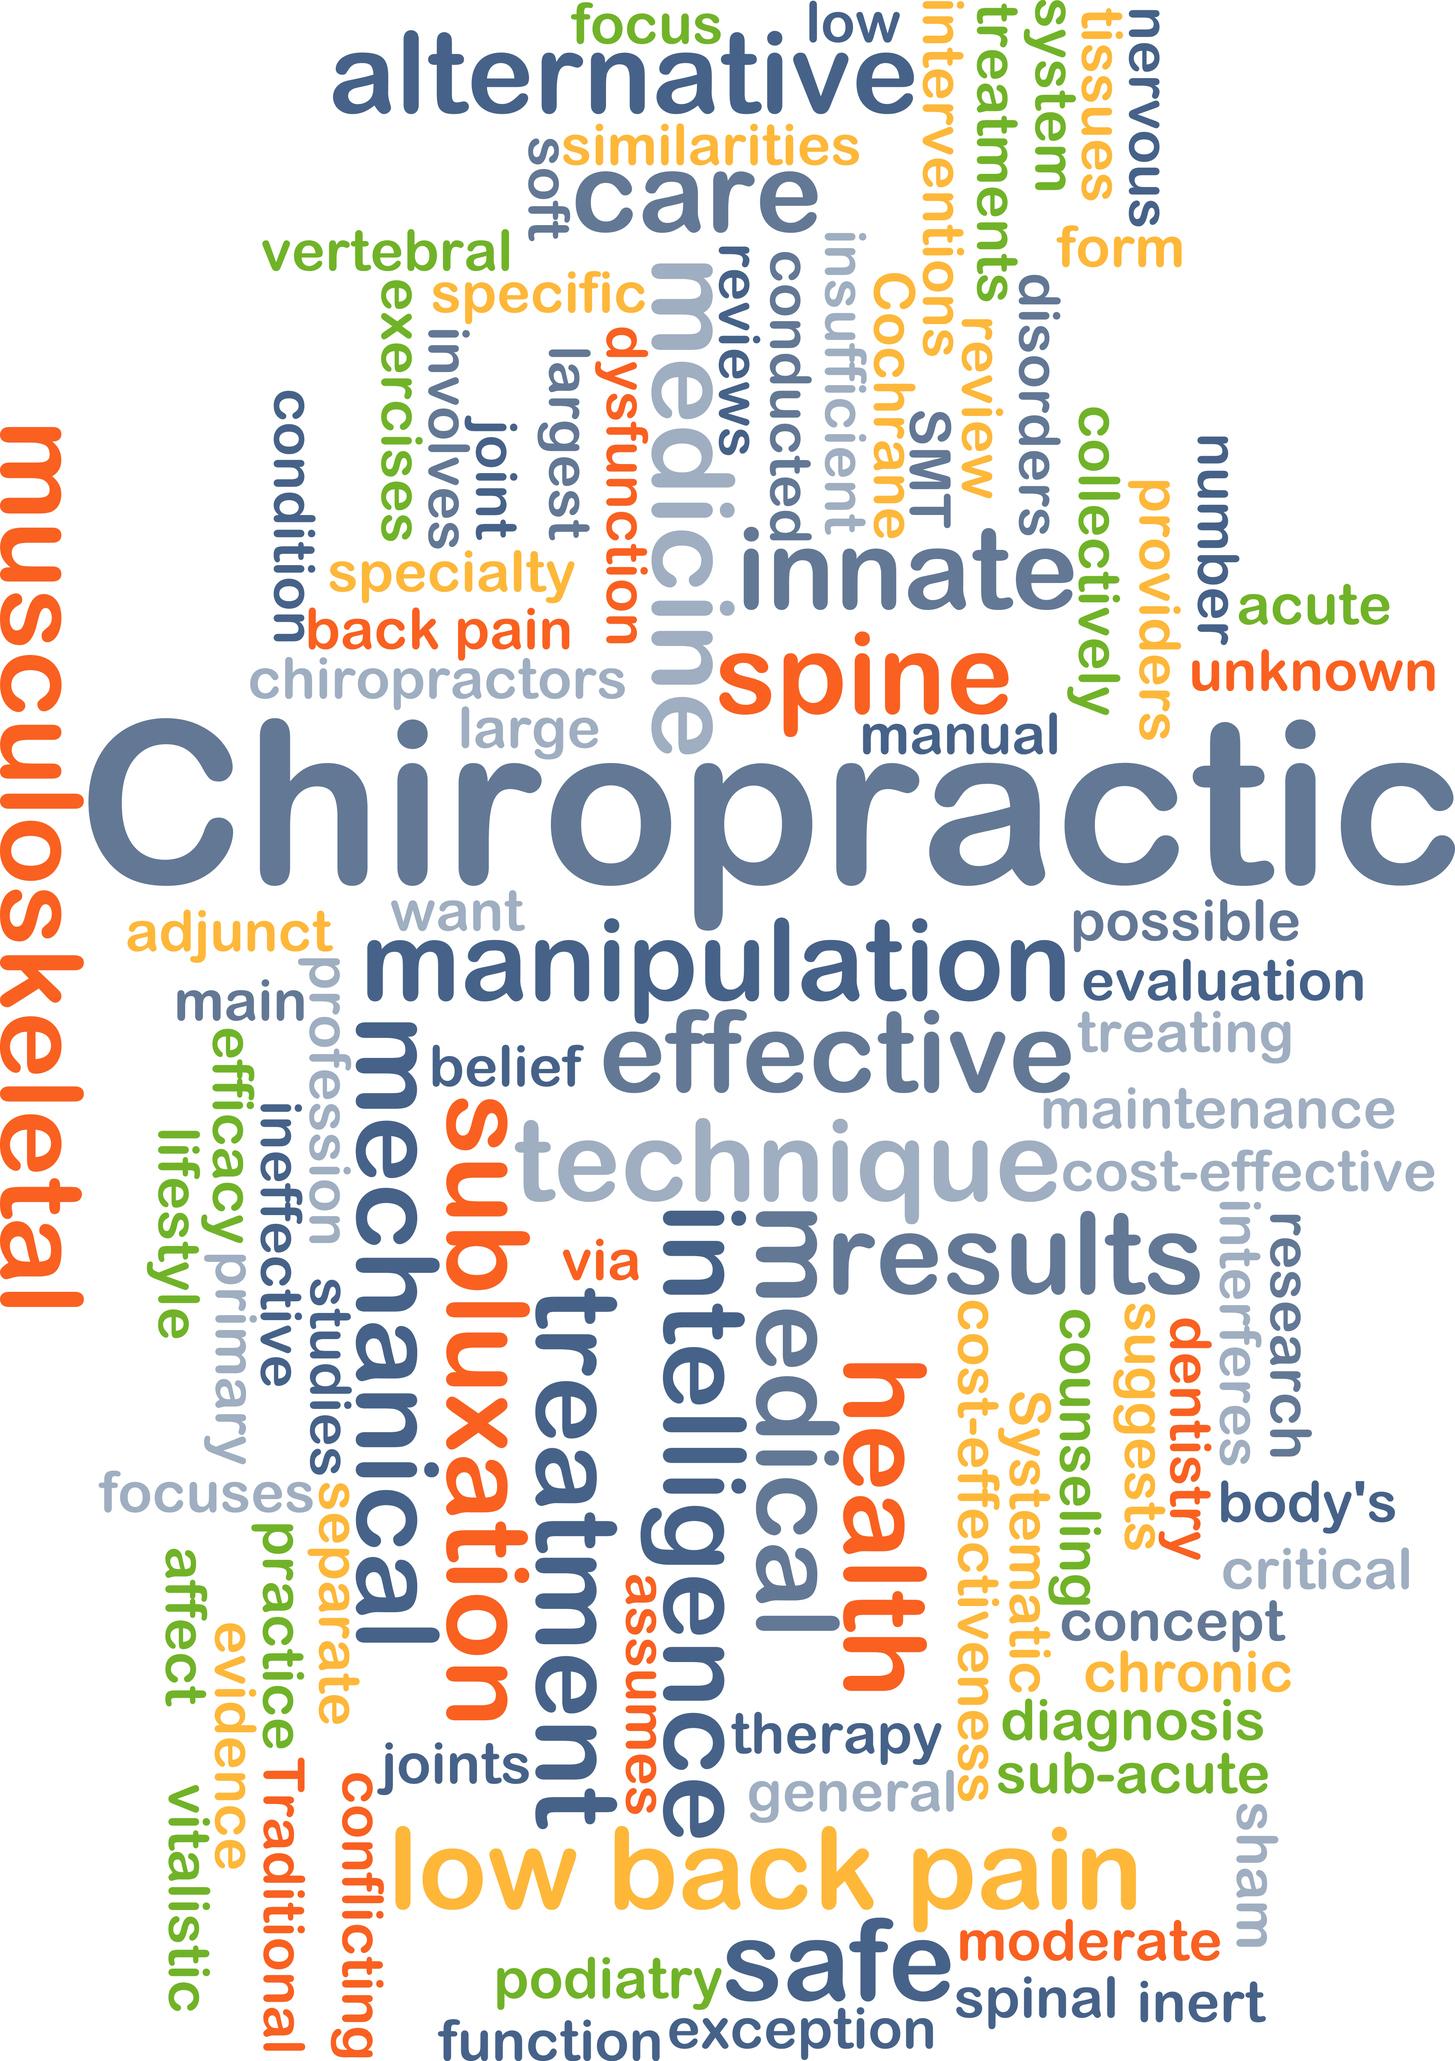 chiropractic-infographic.jpg